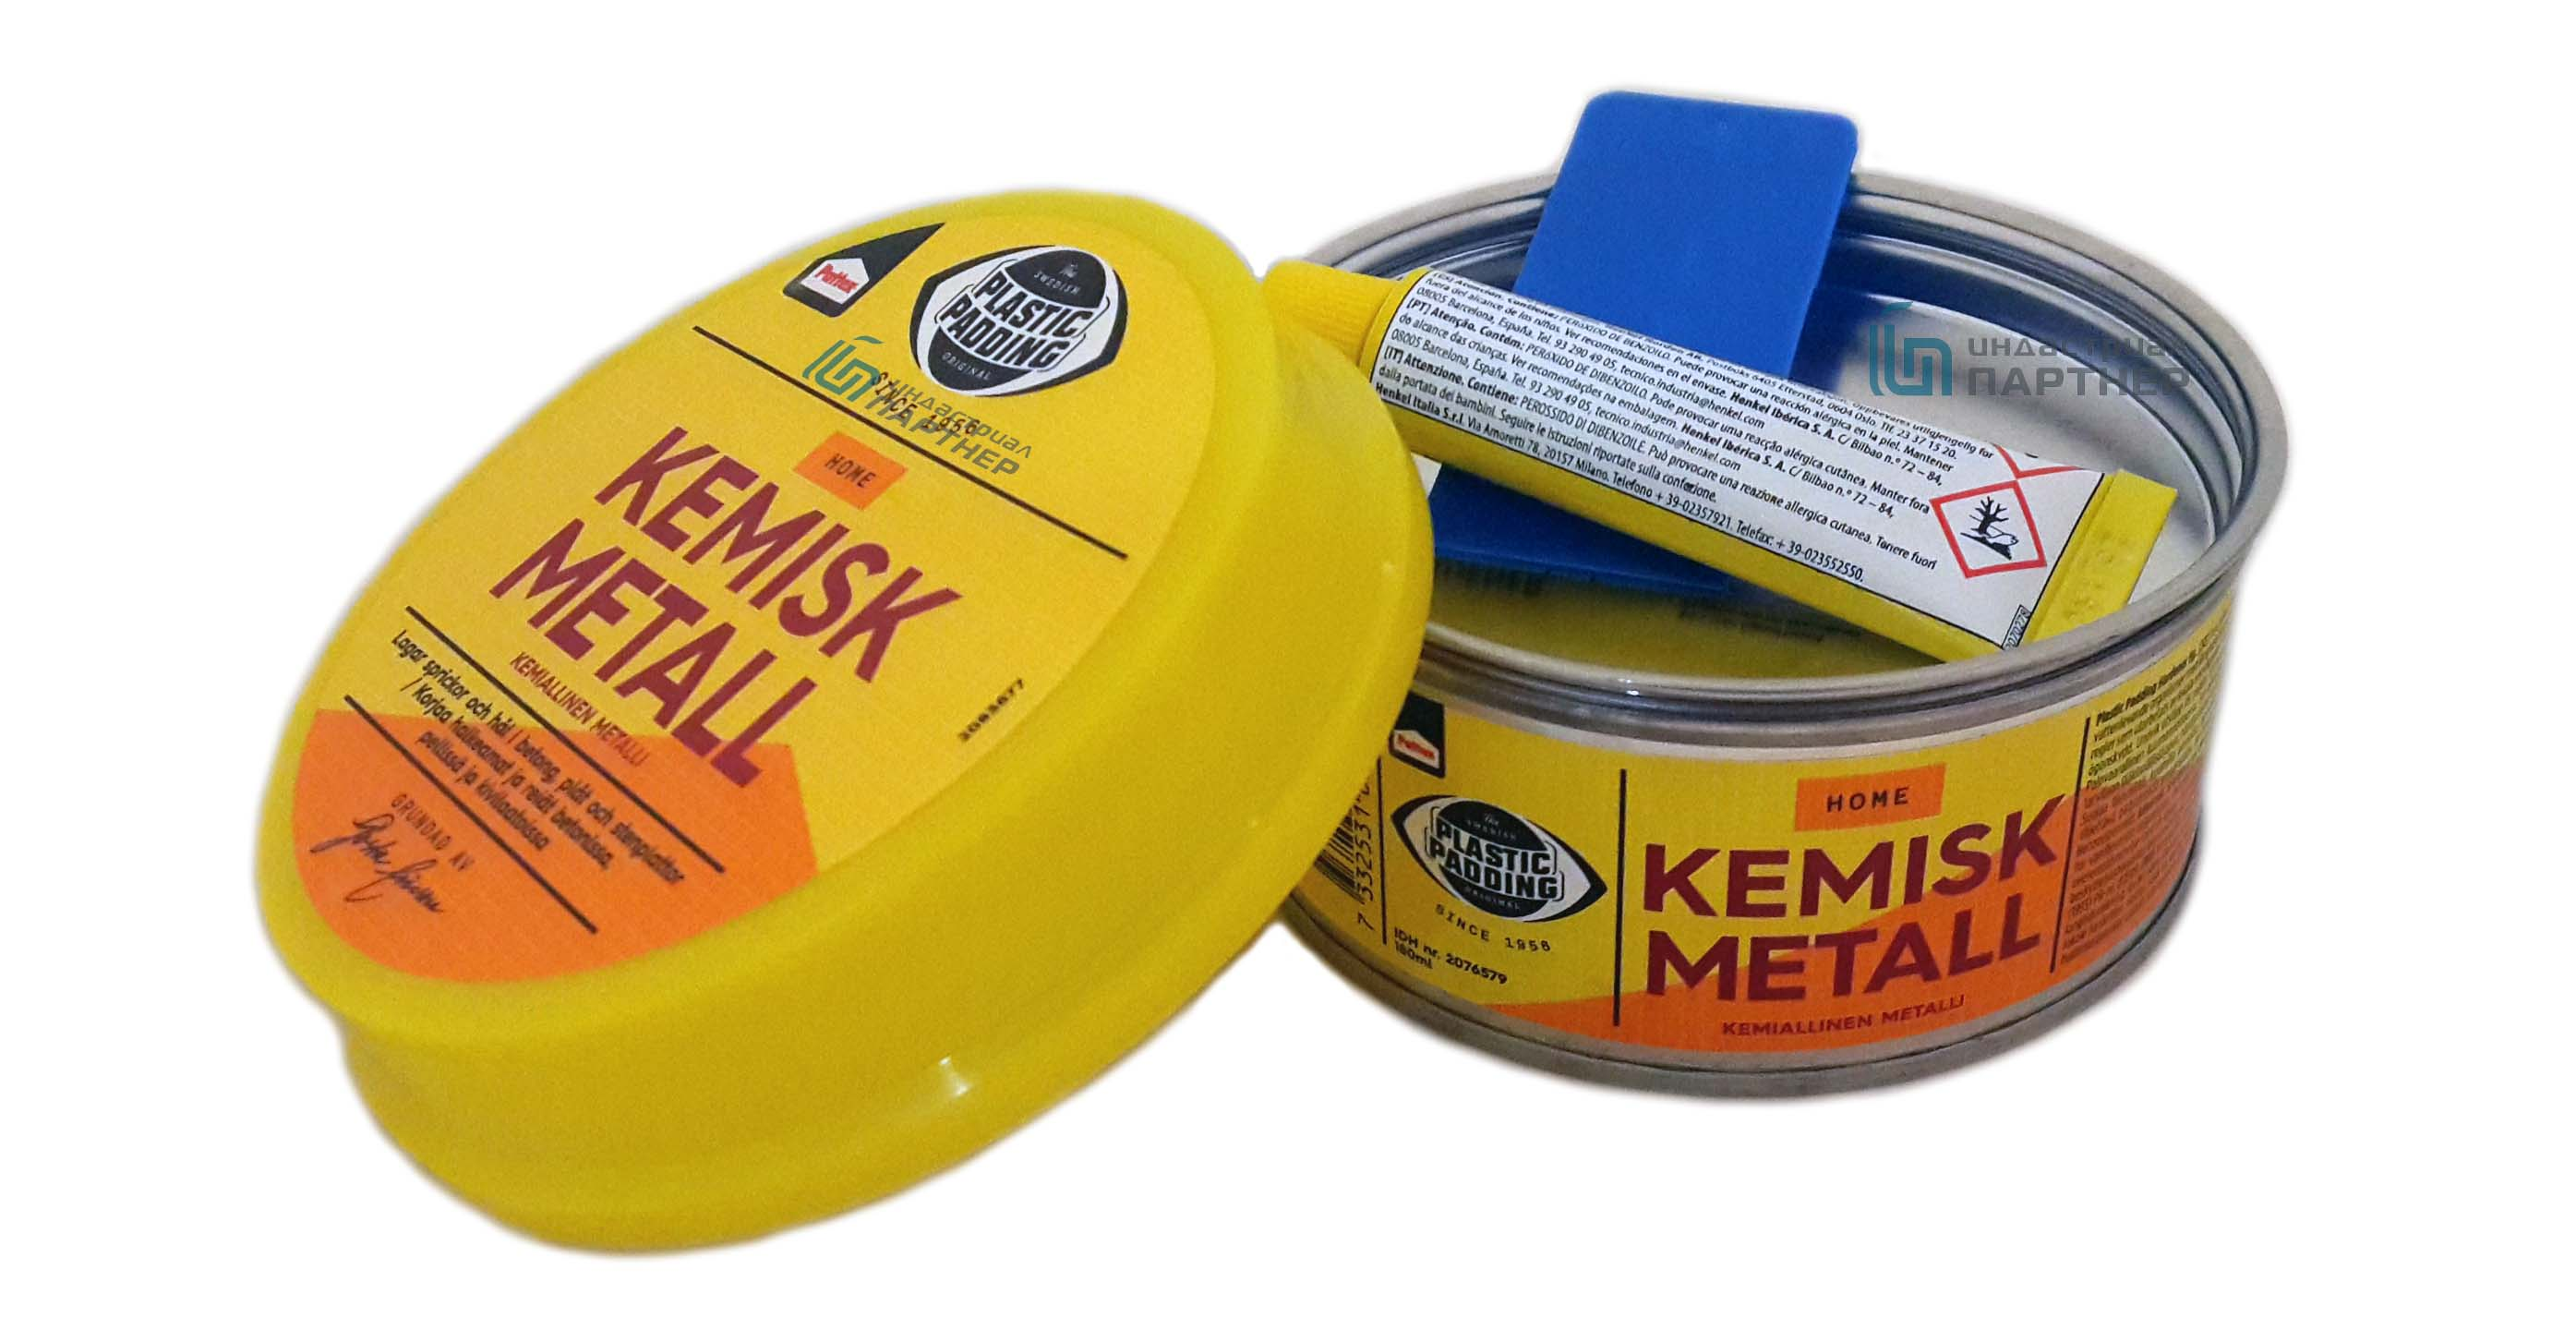 Underbar Chemical Metall :: Loctite (Локтайт) DN-61